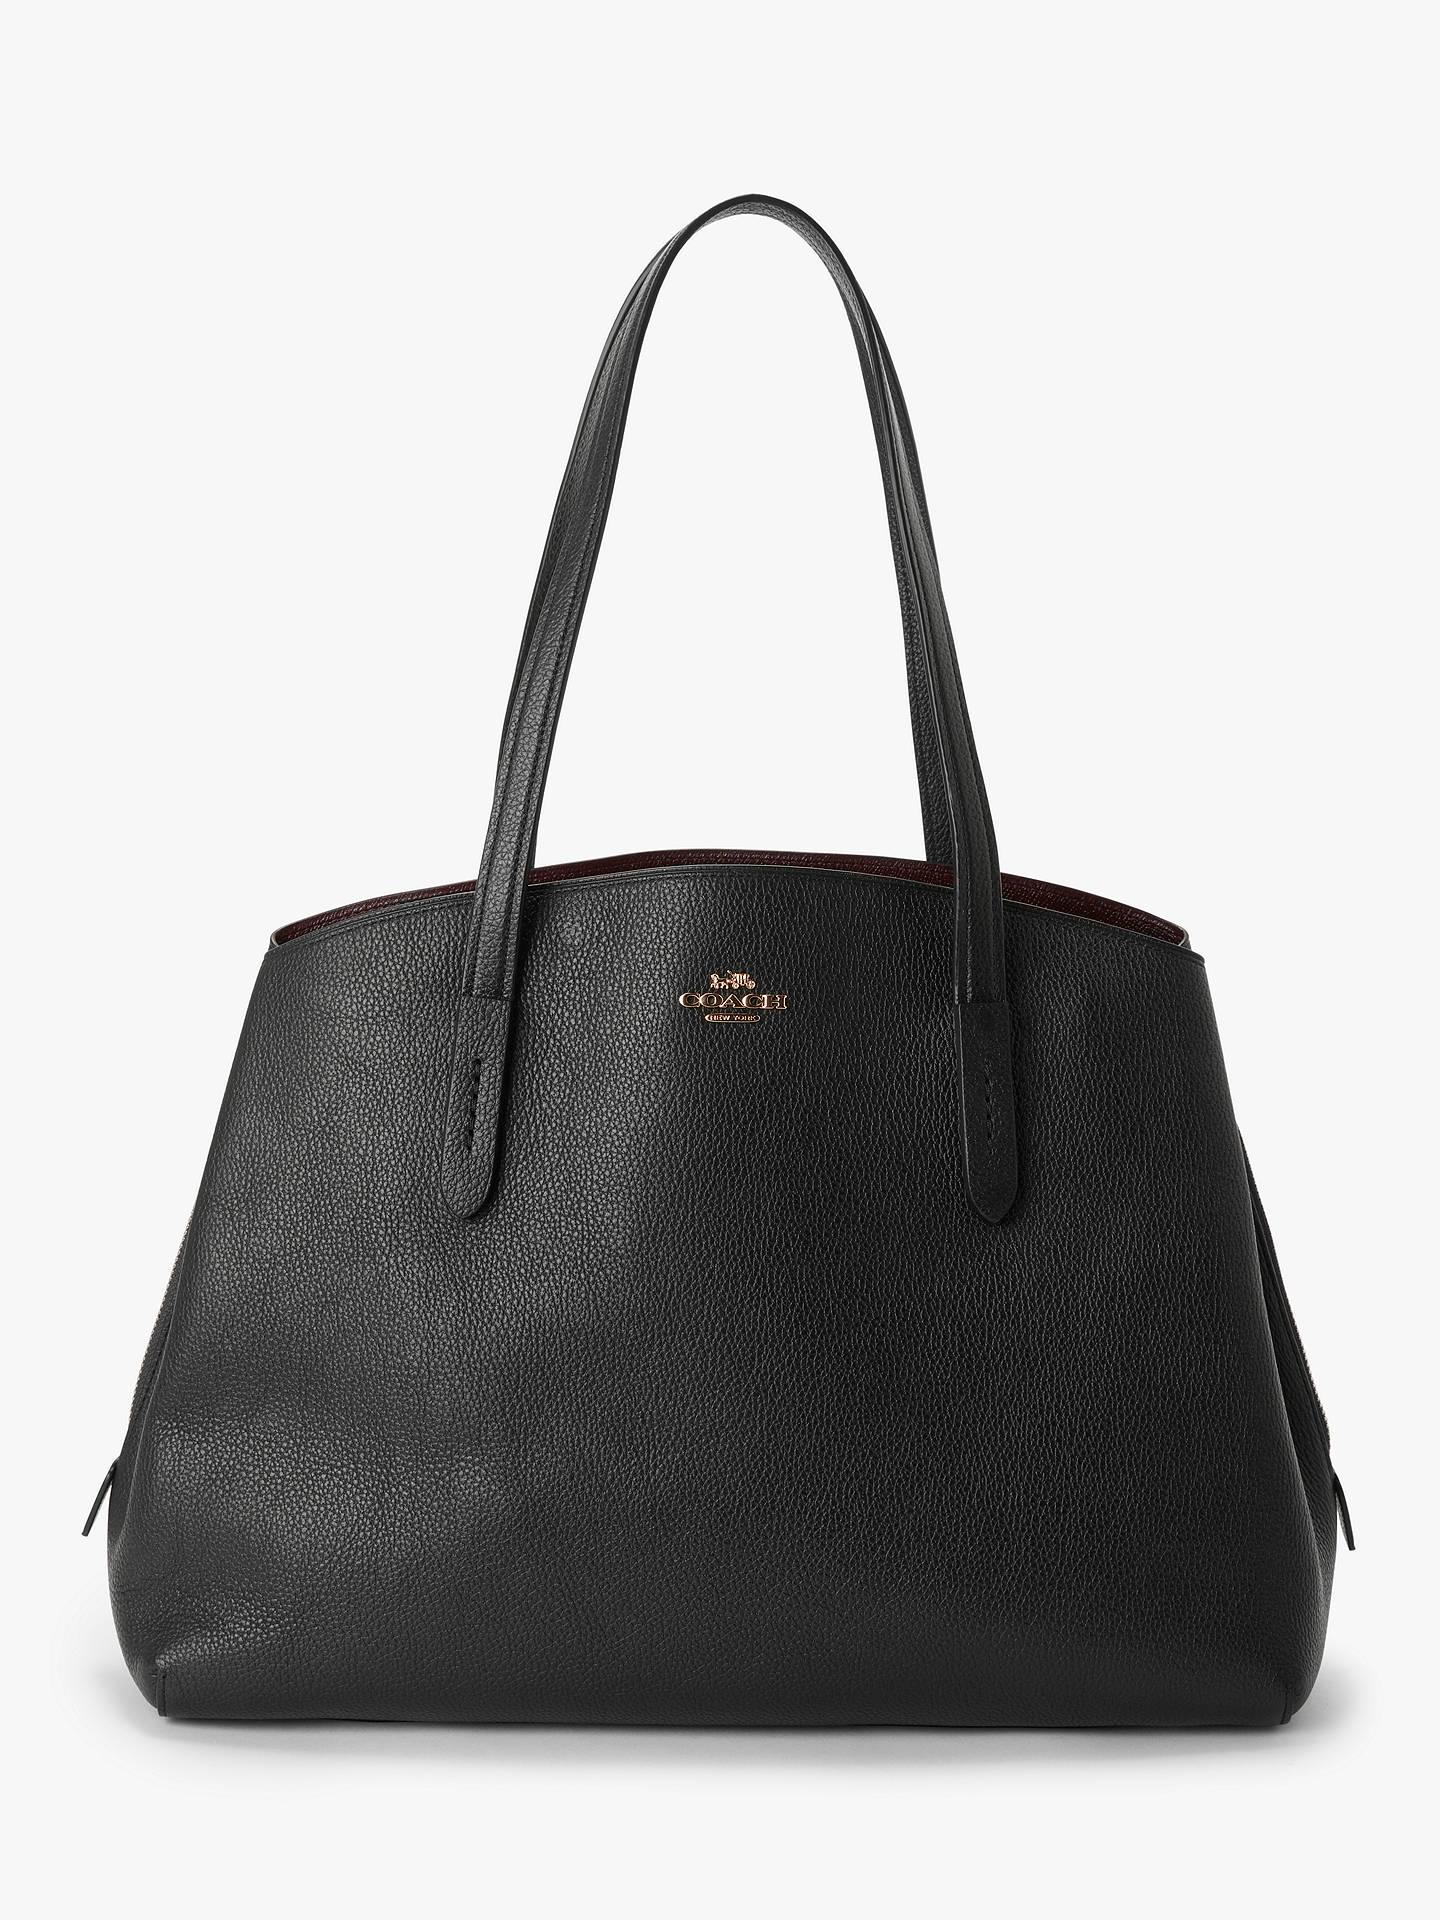 7f9a11ef3b Buy Coach Charlie 40 Leather Carryall Tote Bag, Black Online at  johnlewis.com ...